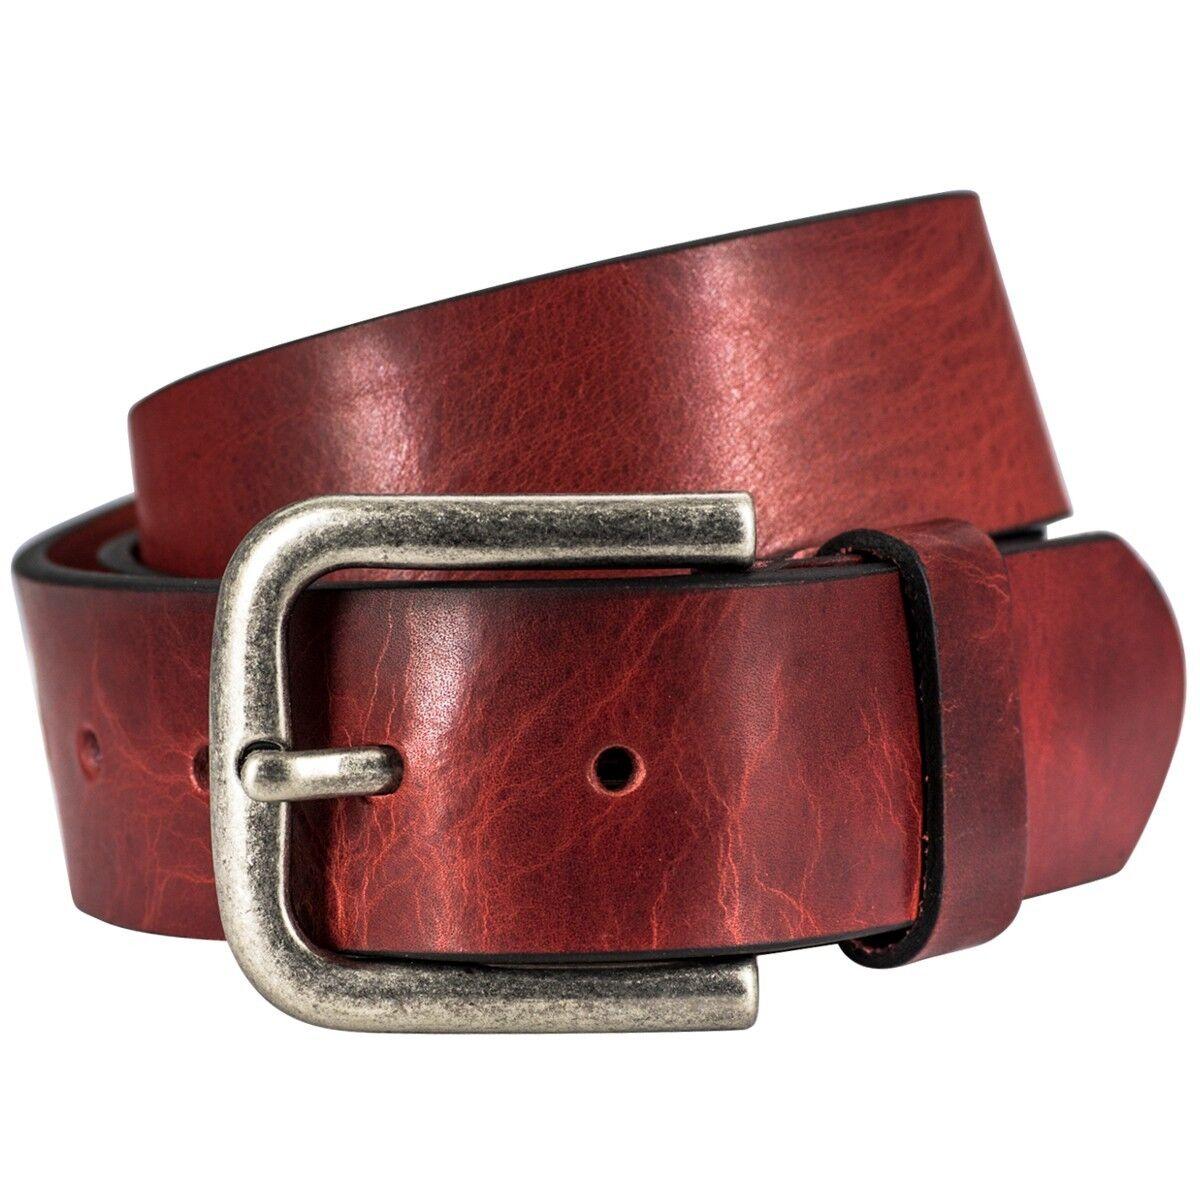 Damengürtel Leder   Herren The Art of of of Belt, Vollrindleder casual unisex, 90107 r | Stilvoll und lustig  | Clearance Sale  973013